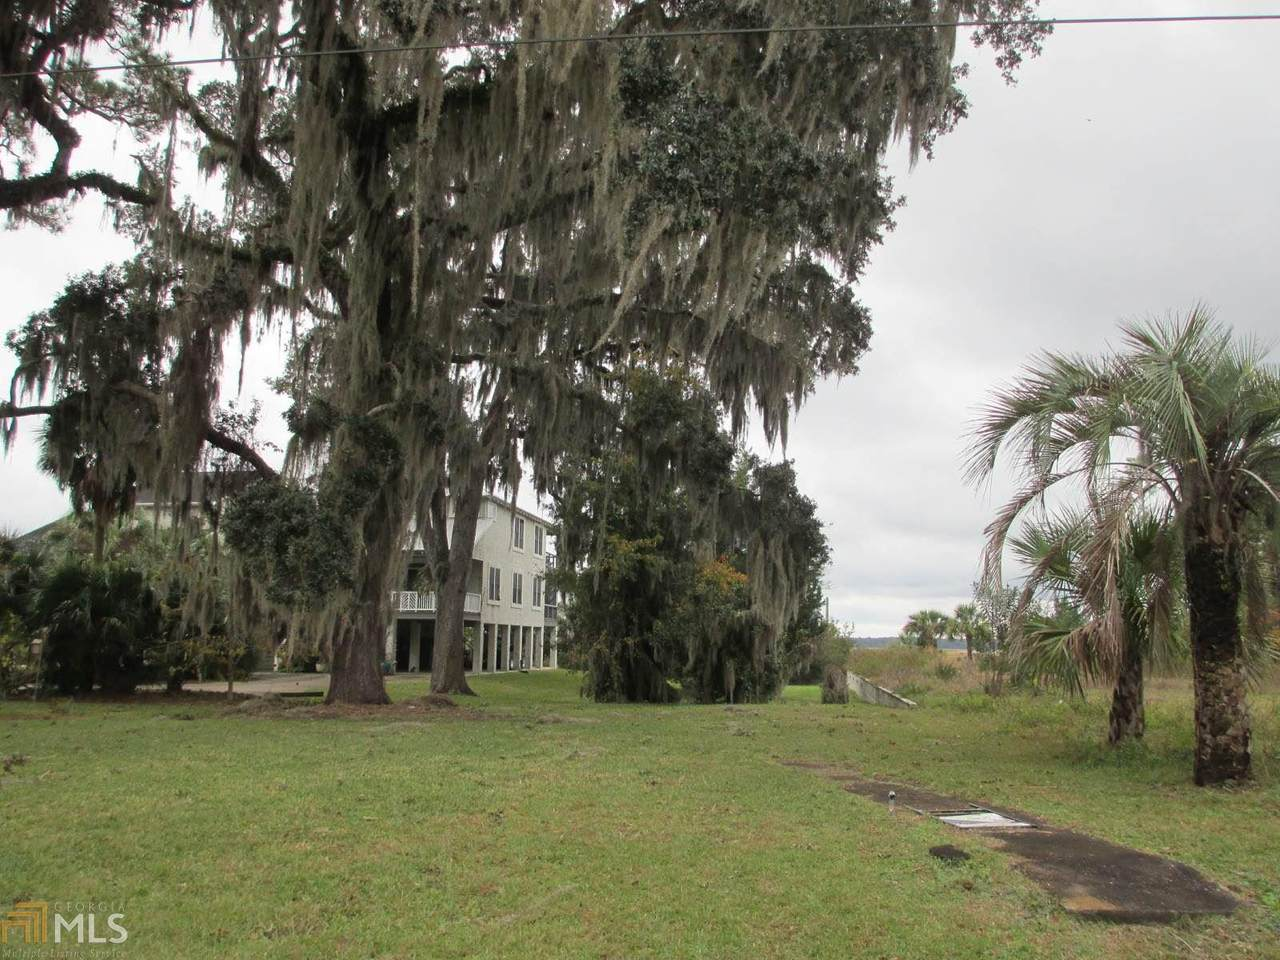 0 Seminole Ave - Photo 1